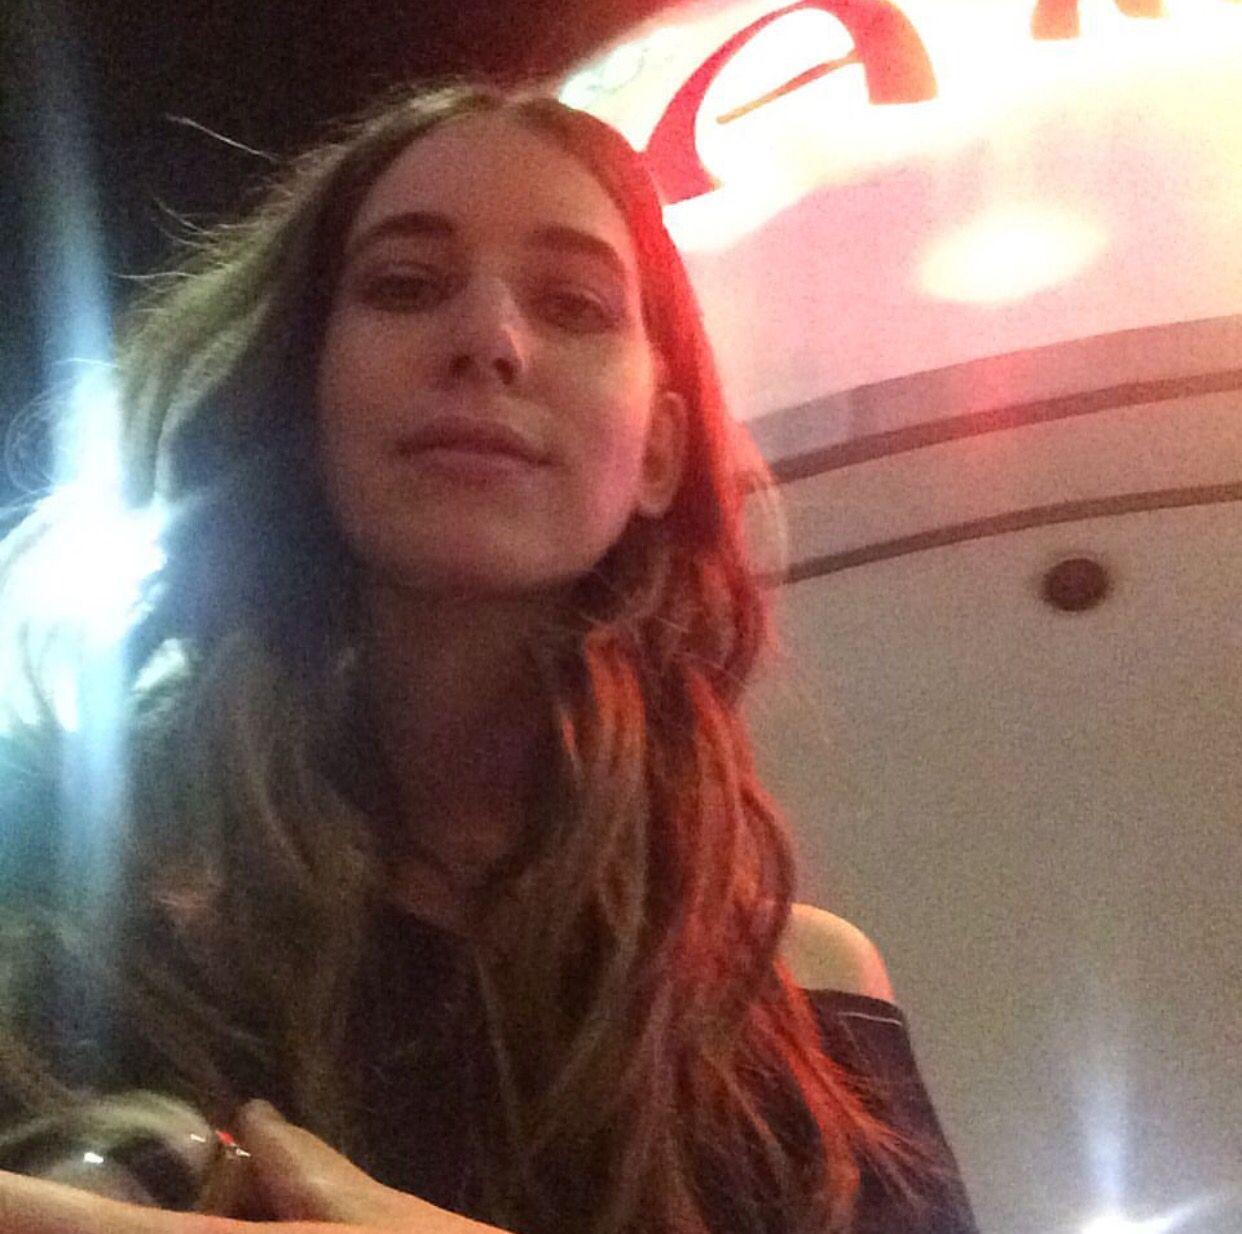 Selfie Danielle Haim nude photos 2019